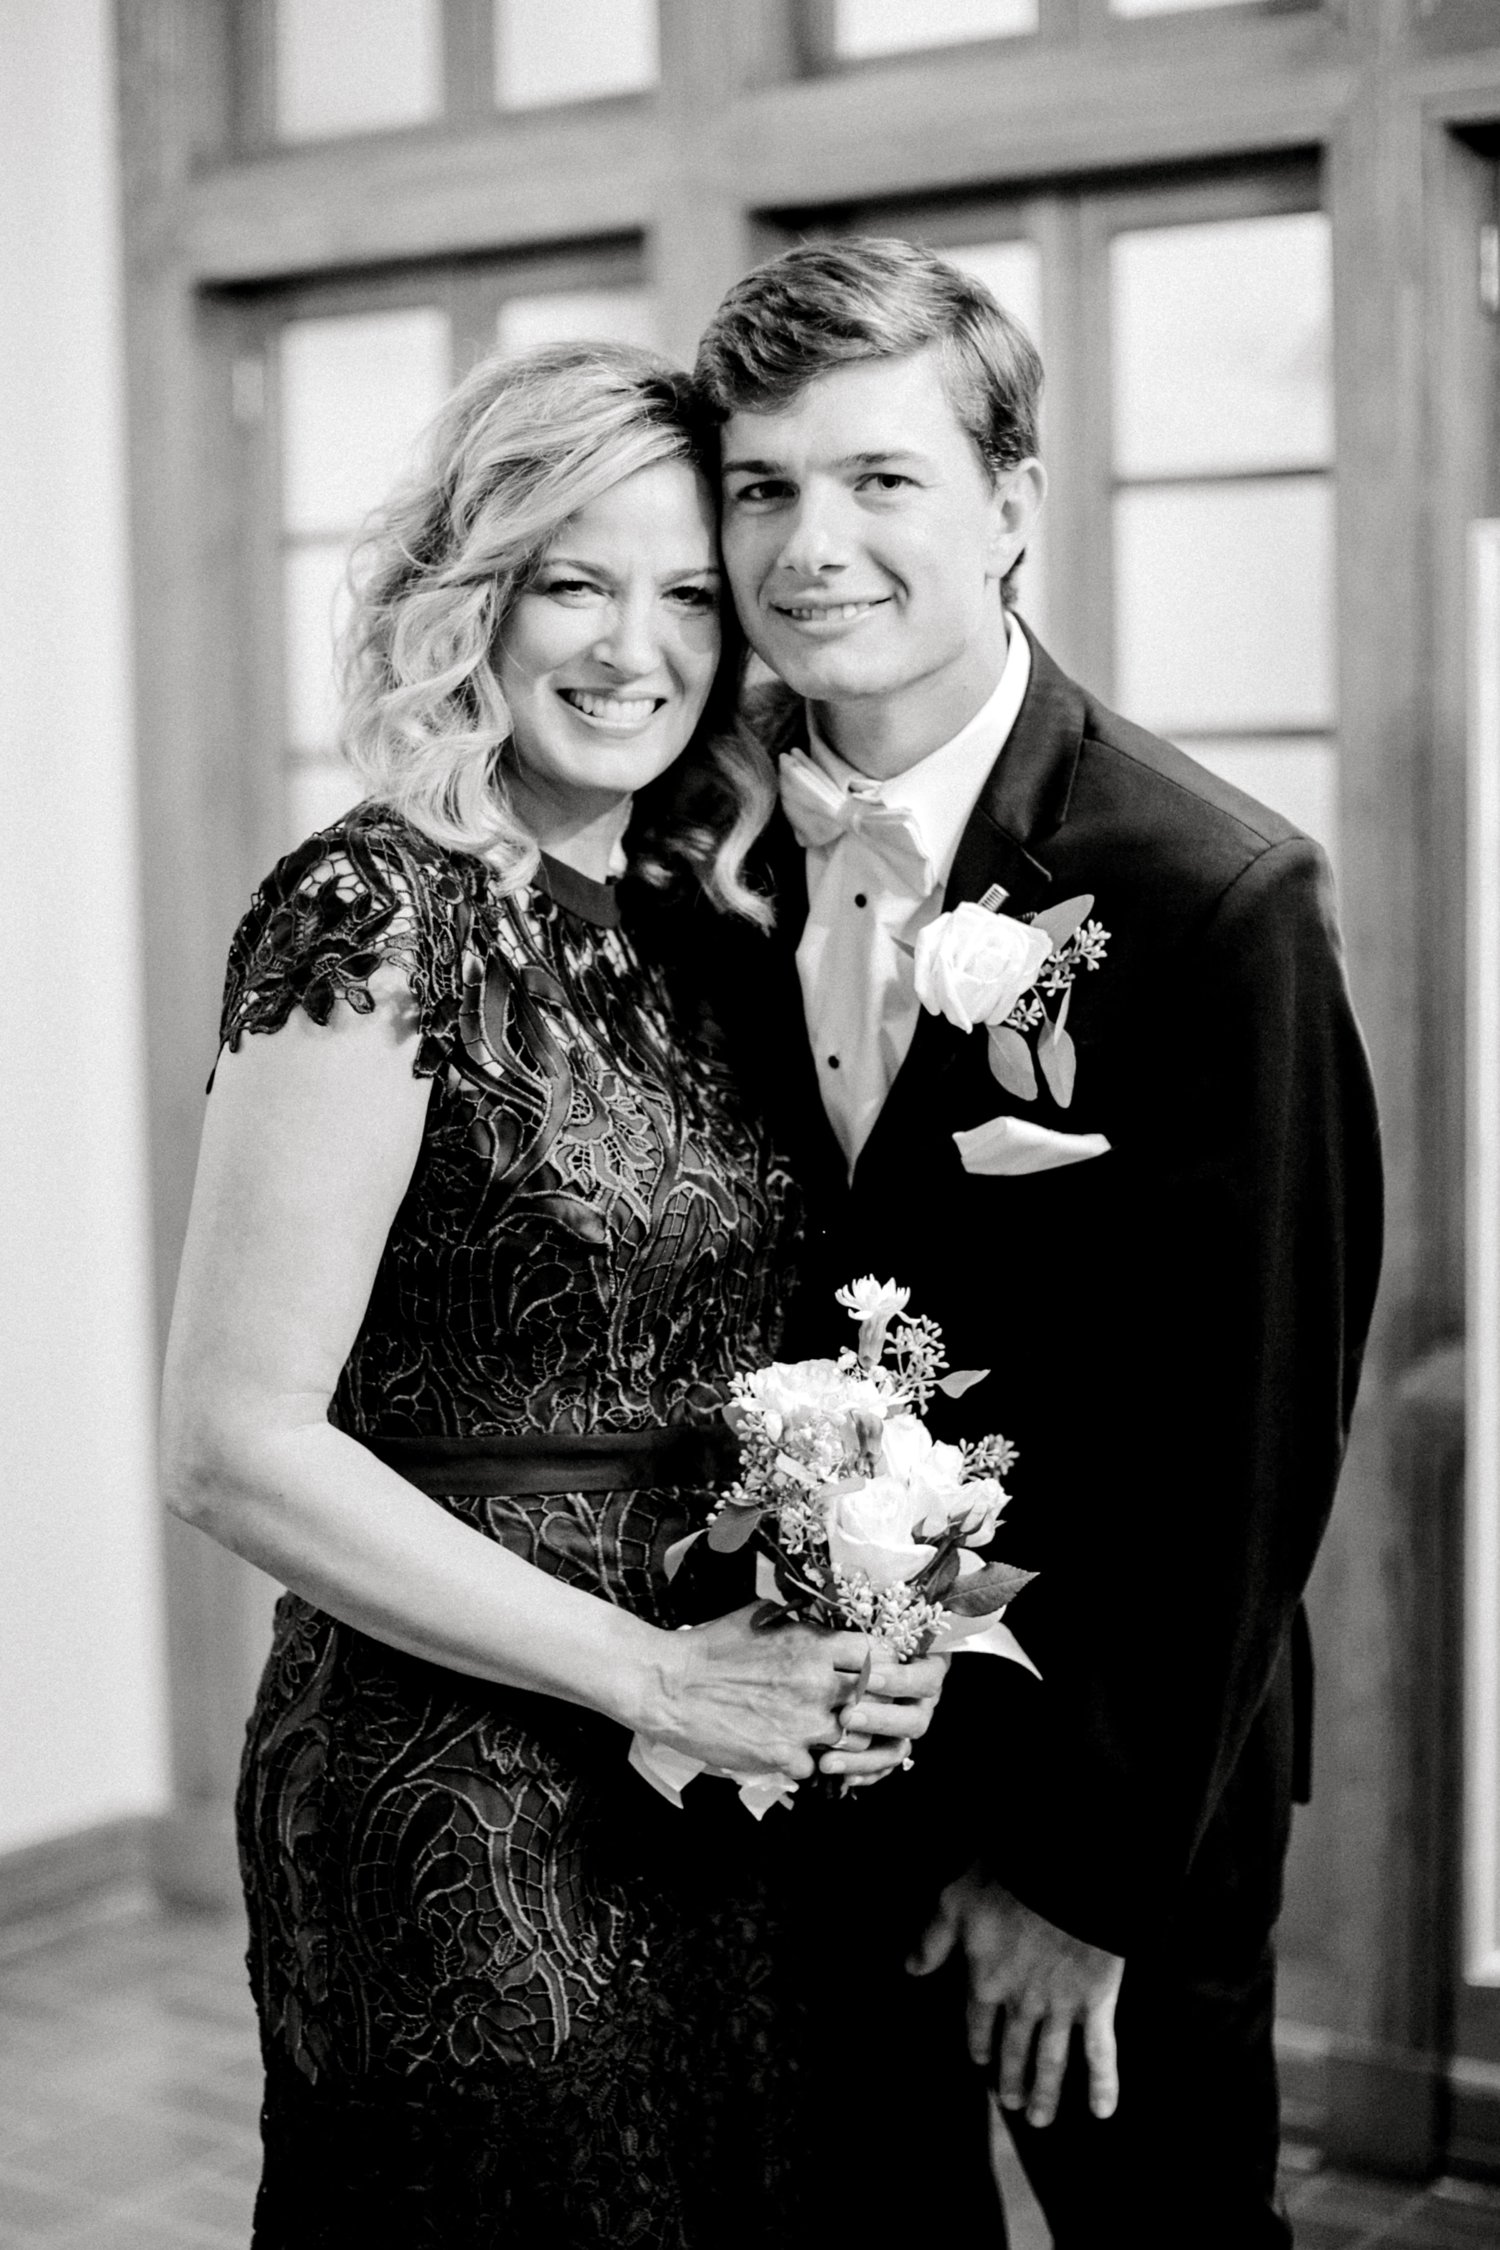 Hunter_and_Molly_Rawls_ALLEEJ_Lubbock_WEDDING_Legacy_Event_Center_0068.jpg